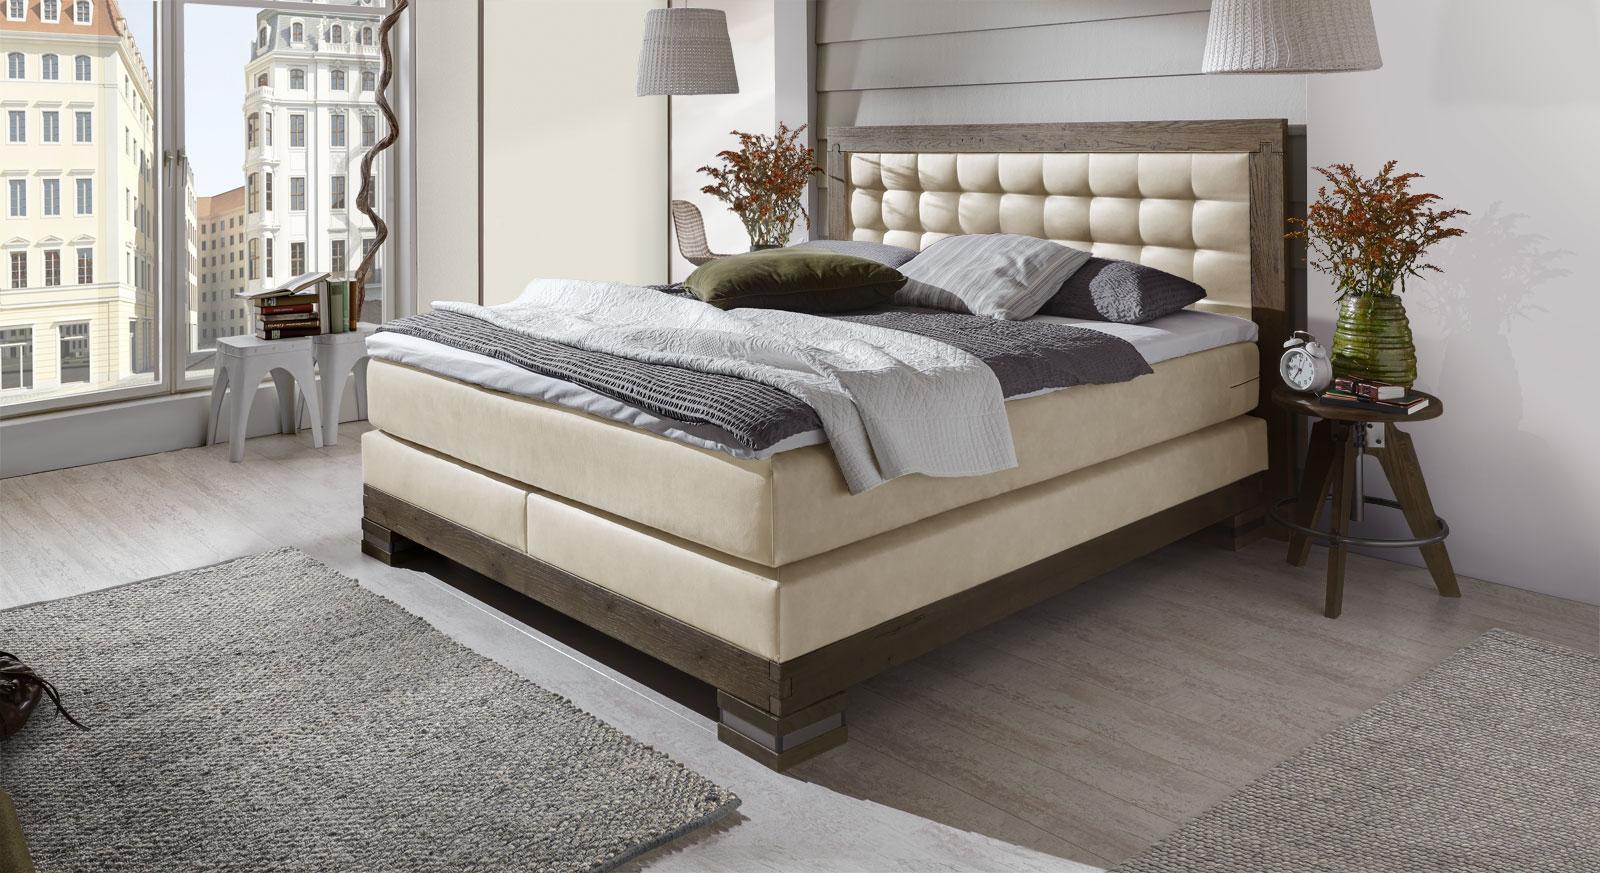 edles landhausstil boxspringbett aus wildeiche aronia. Black Bedroom Furniture Sets. Home Design Ideas